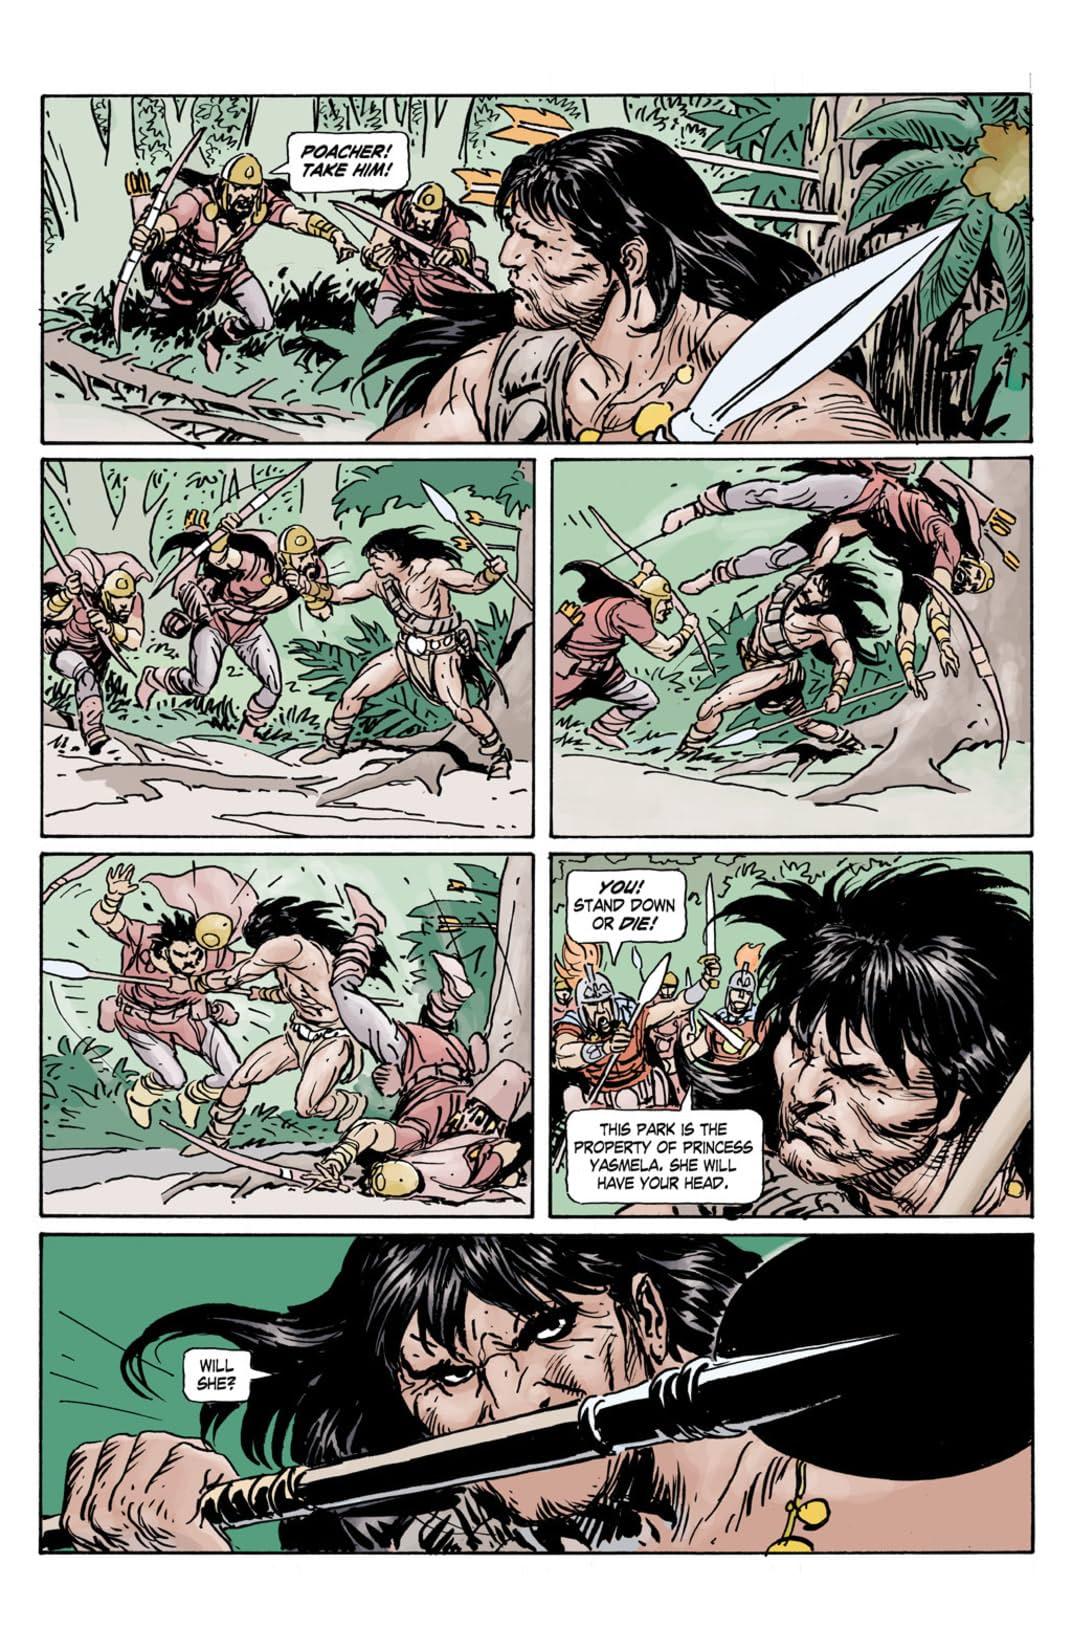 Conan the Cimmerian #14